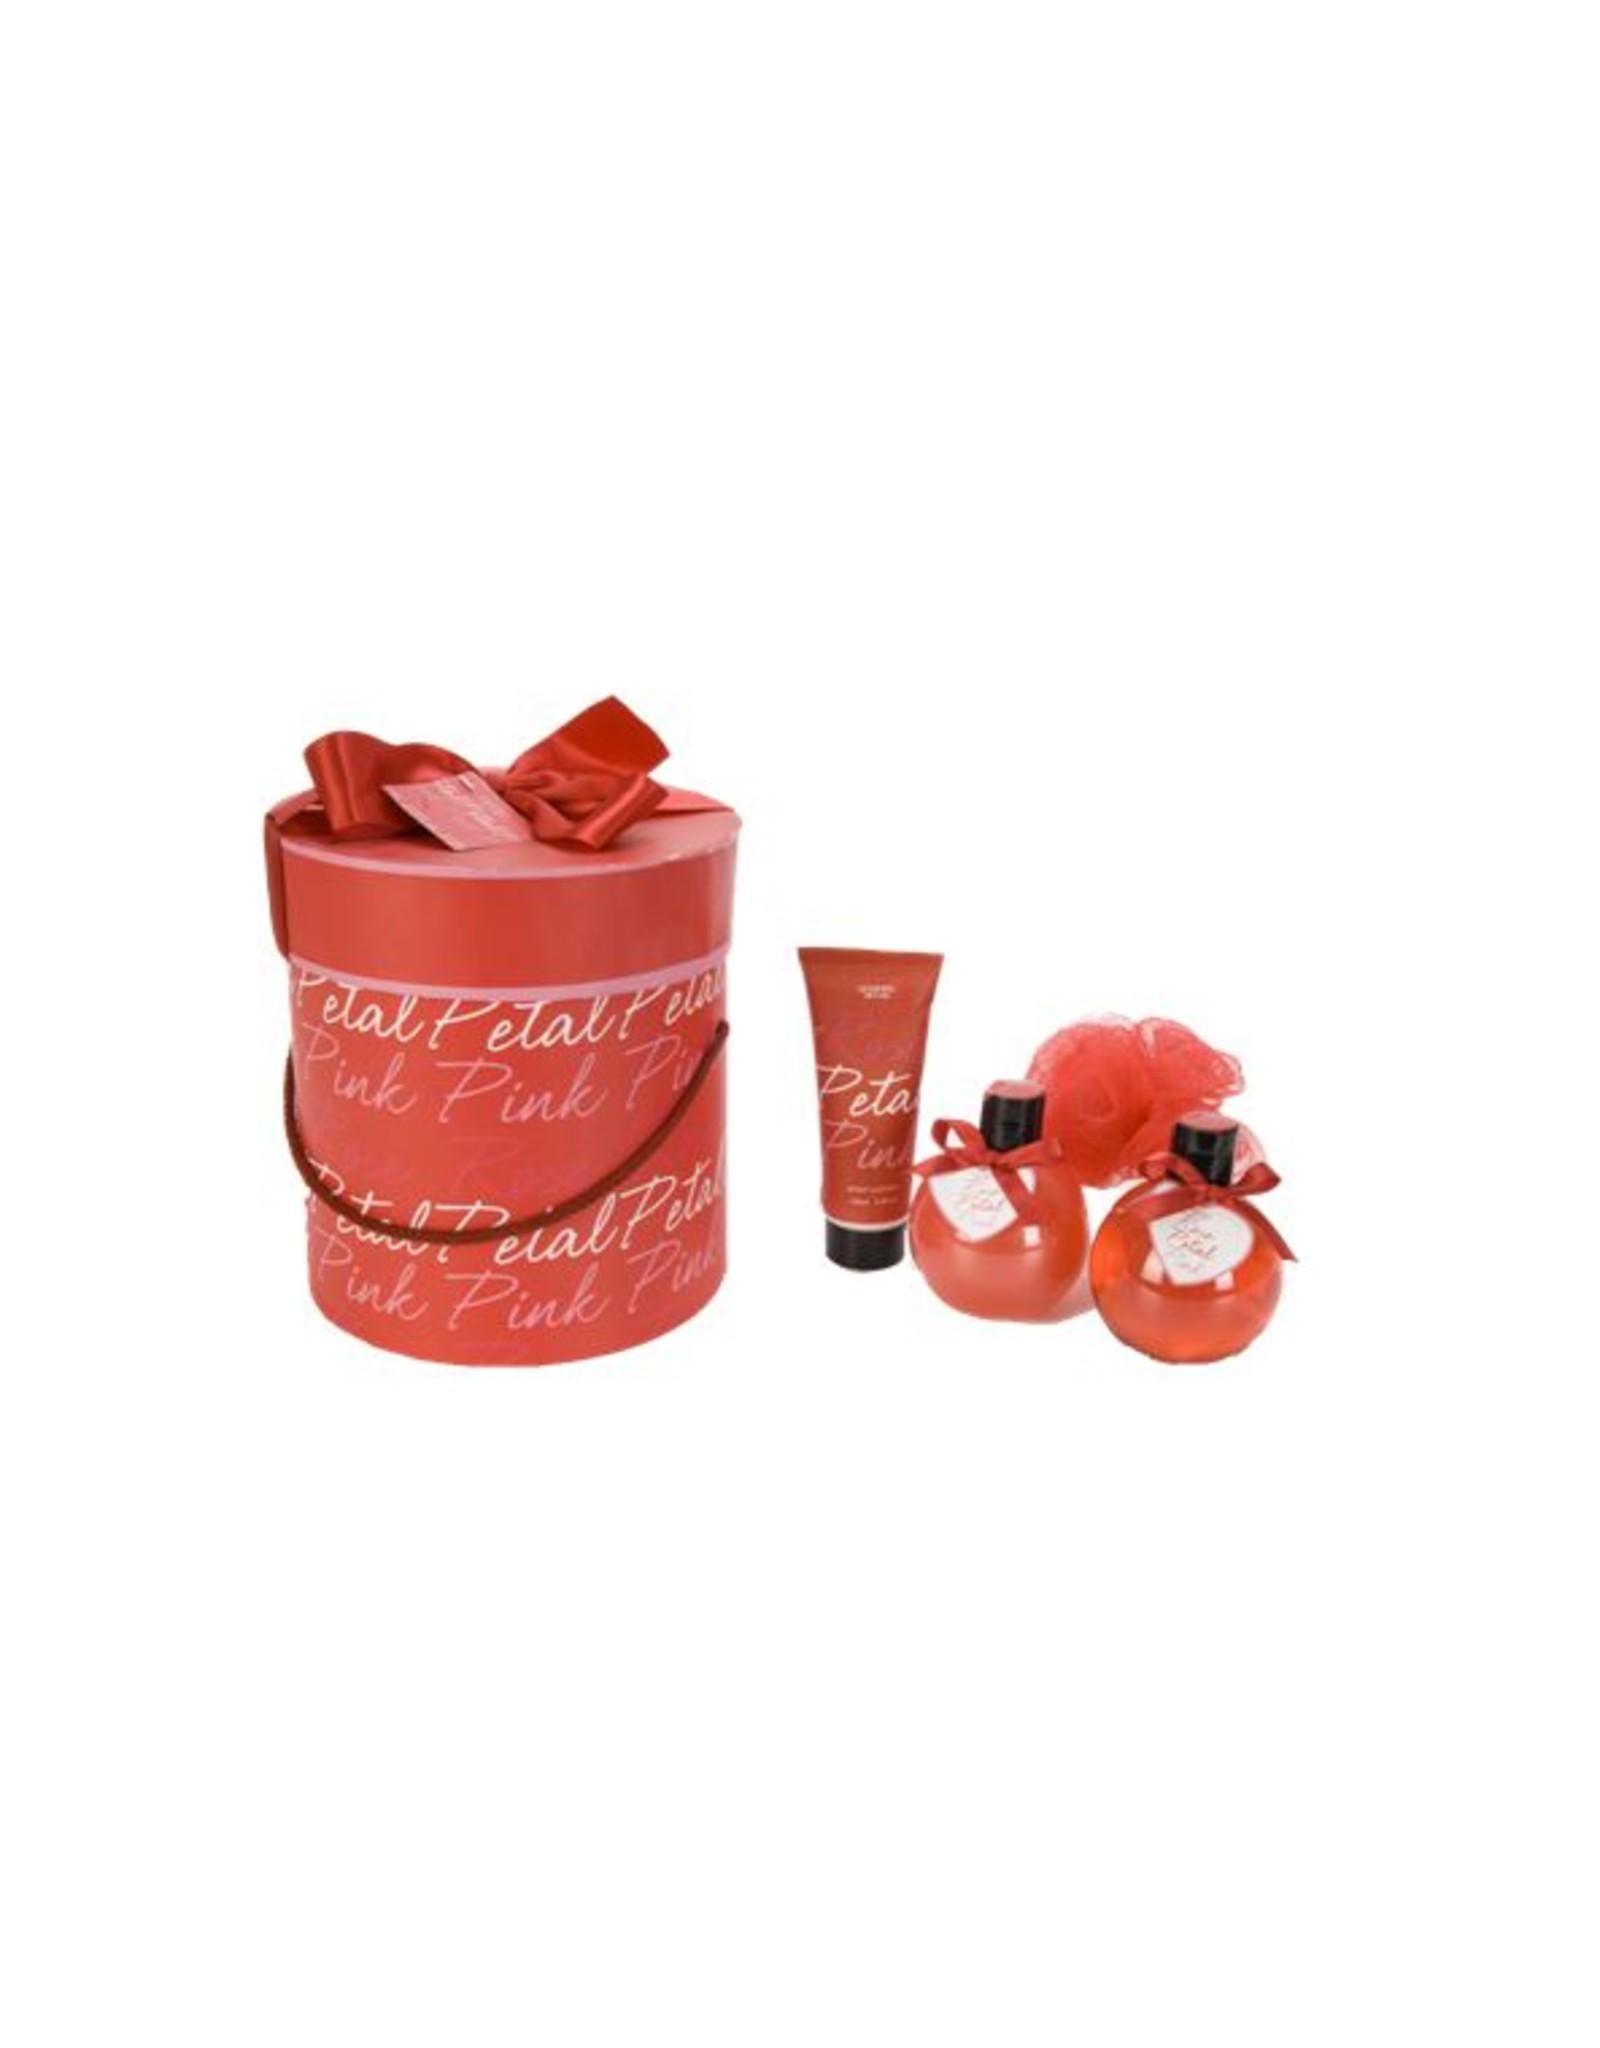 Giftset 'Rose Petal' - Body & Soap